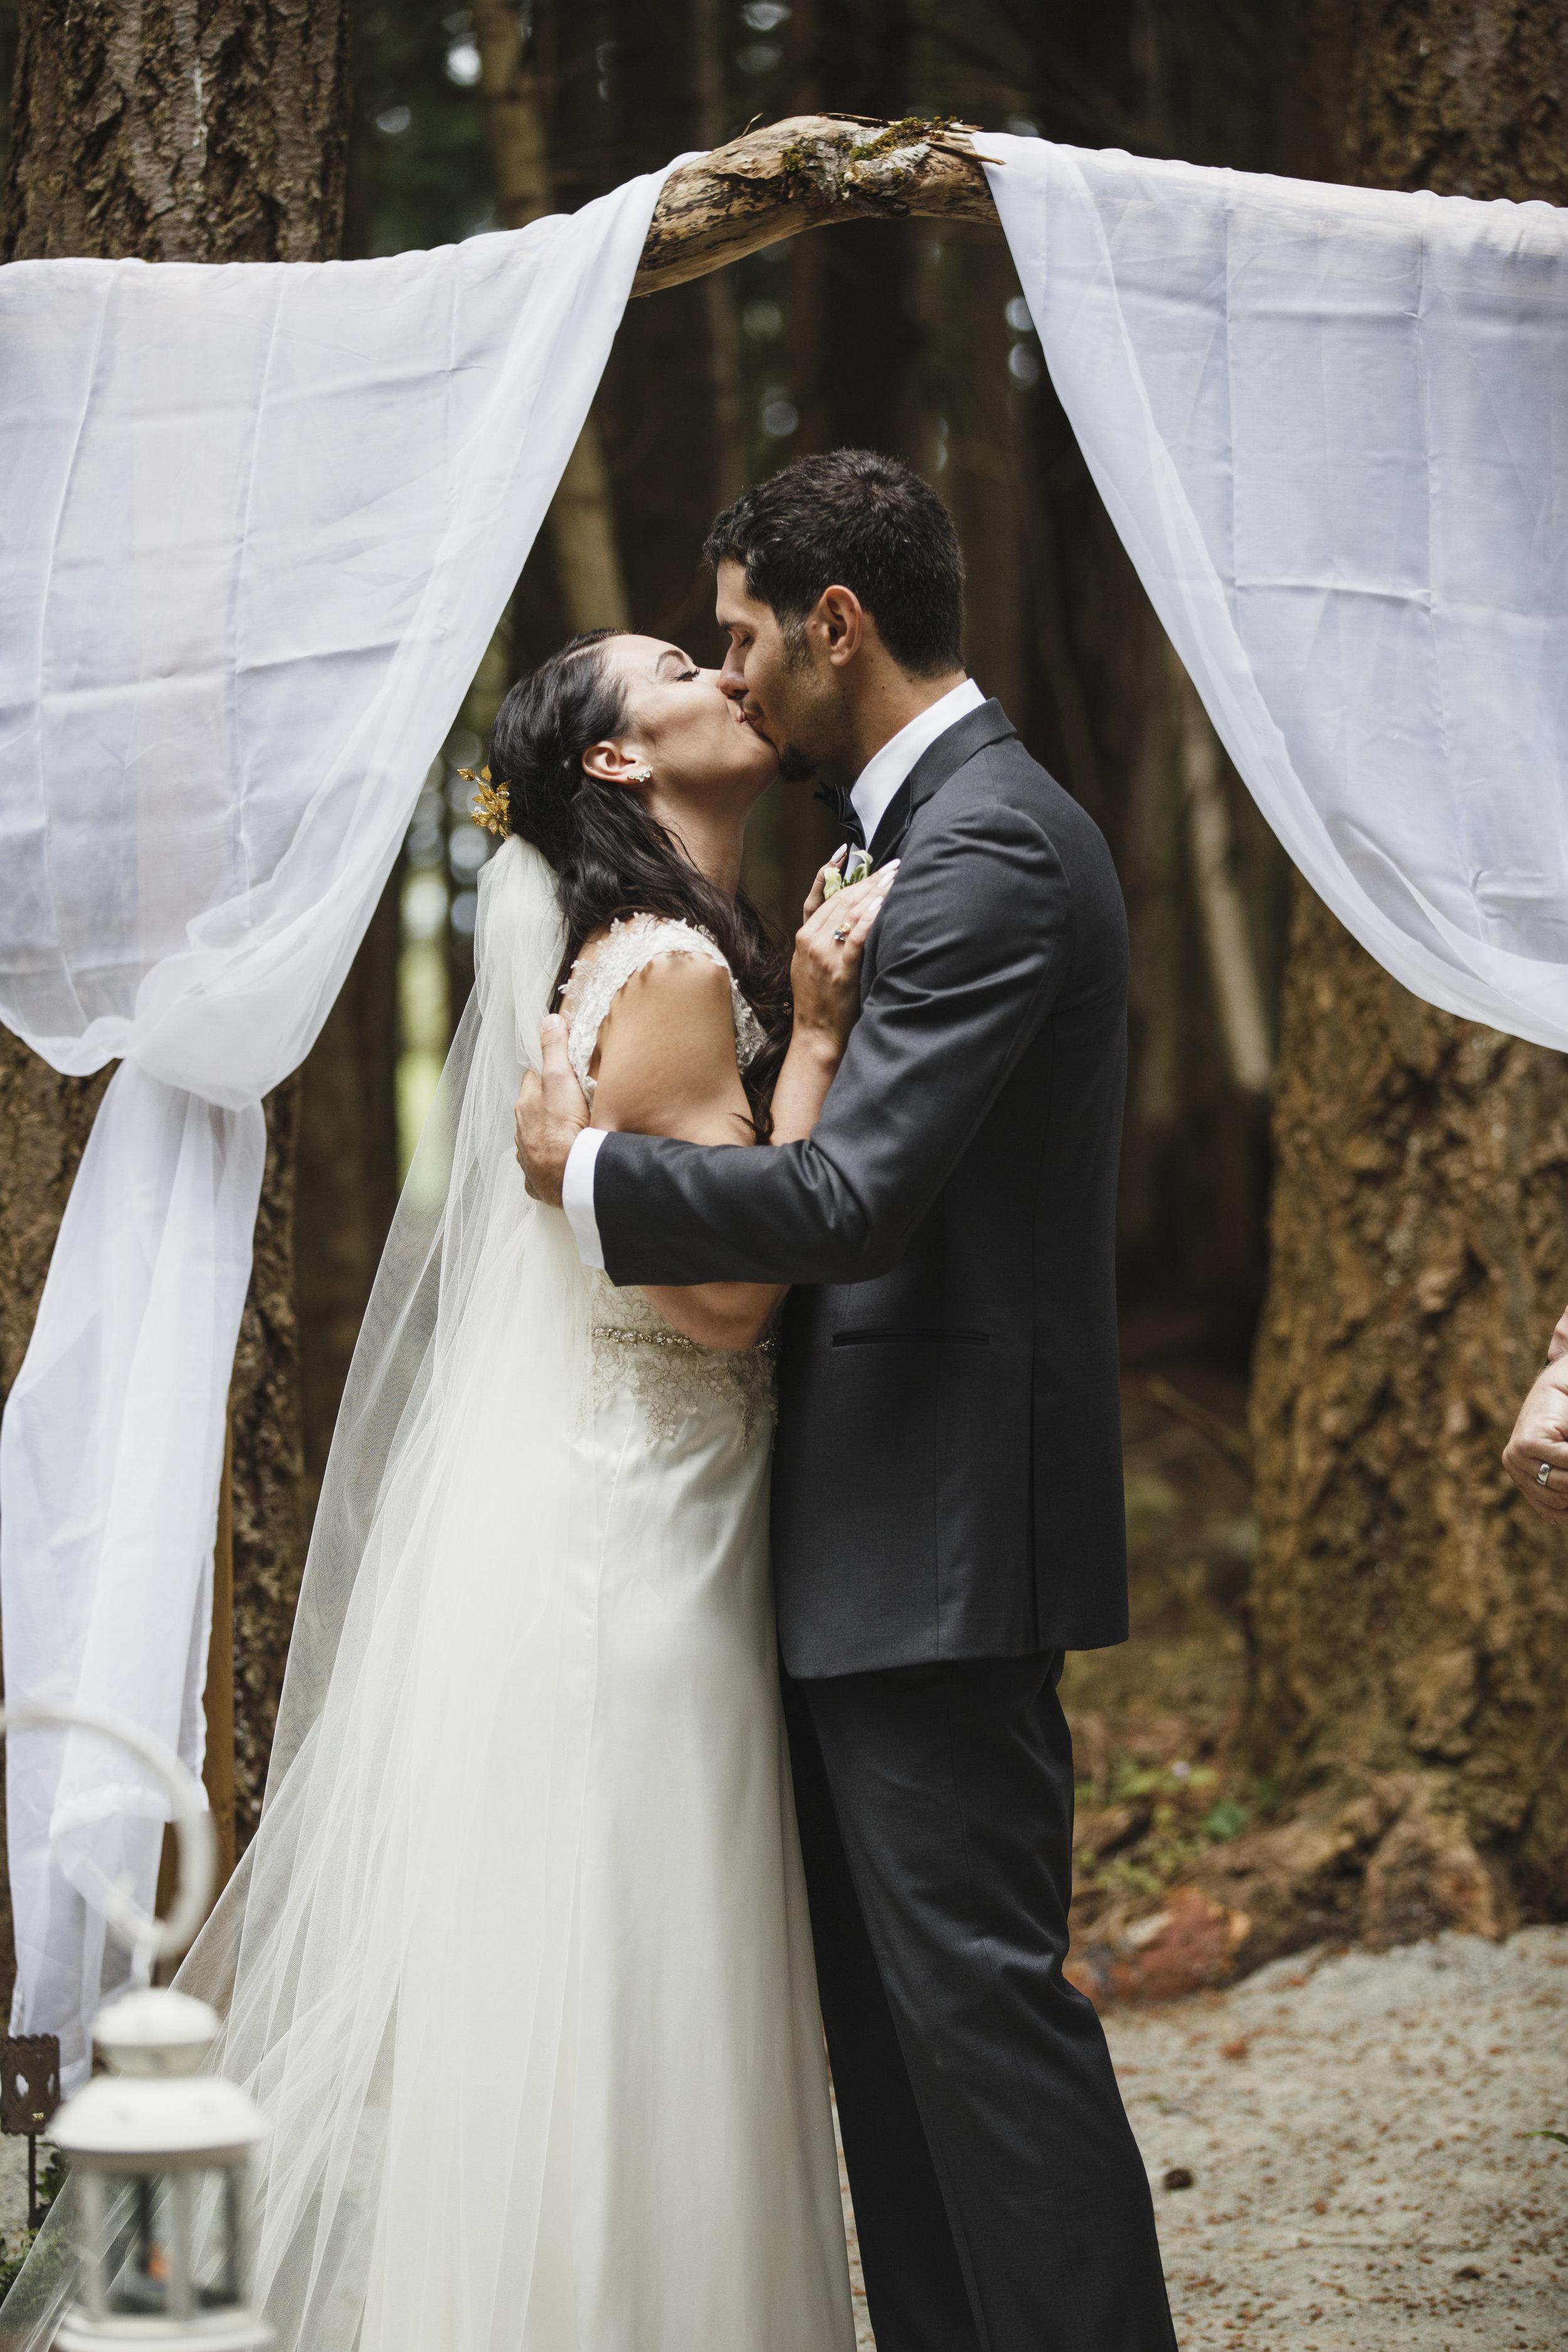 Groom kisses his bride Forest wedding Tofino Sea Cider Vancouver Island